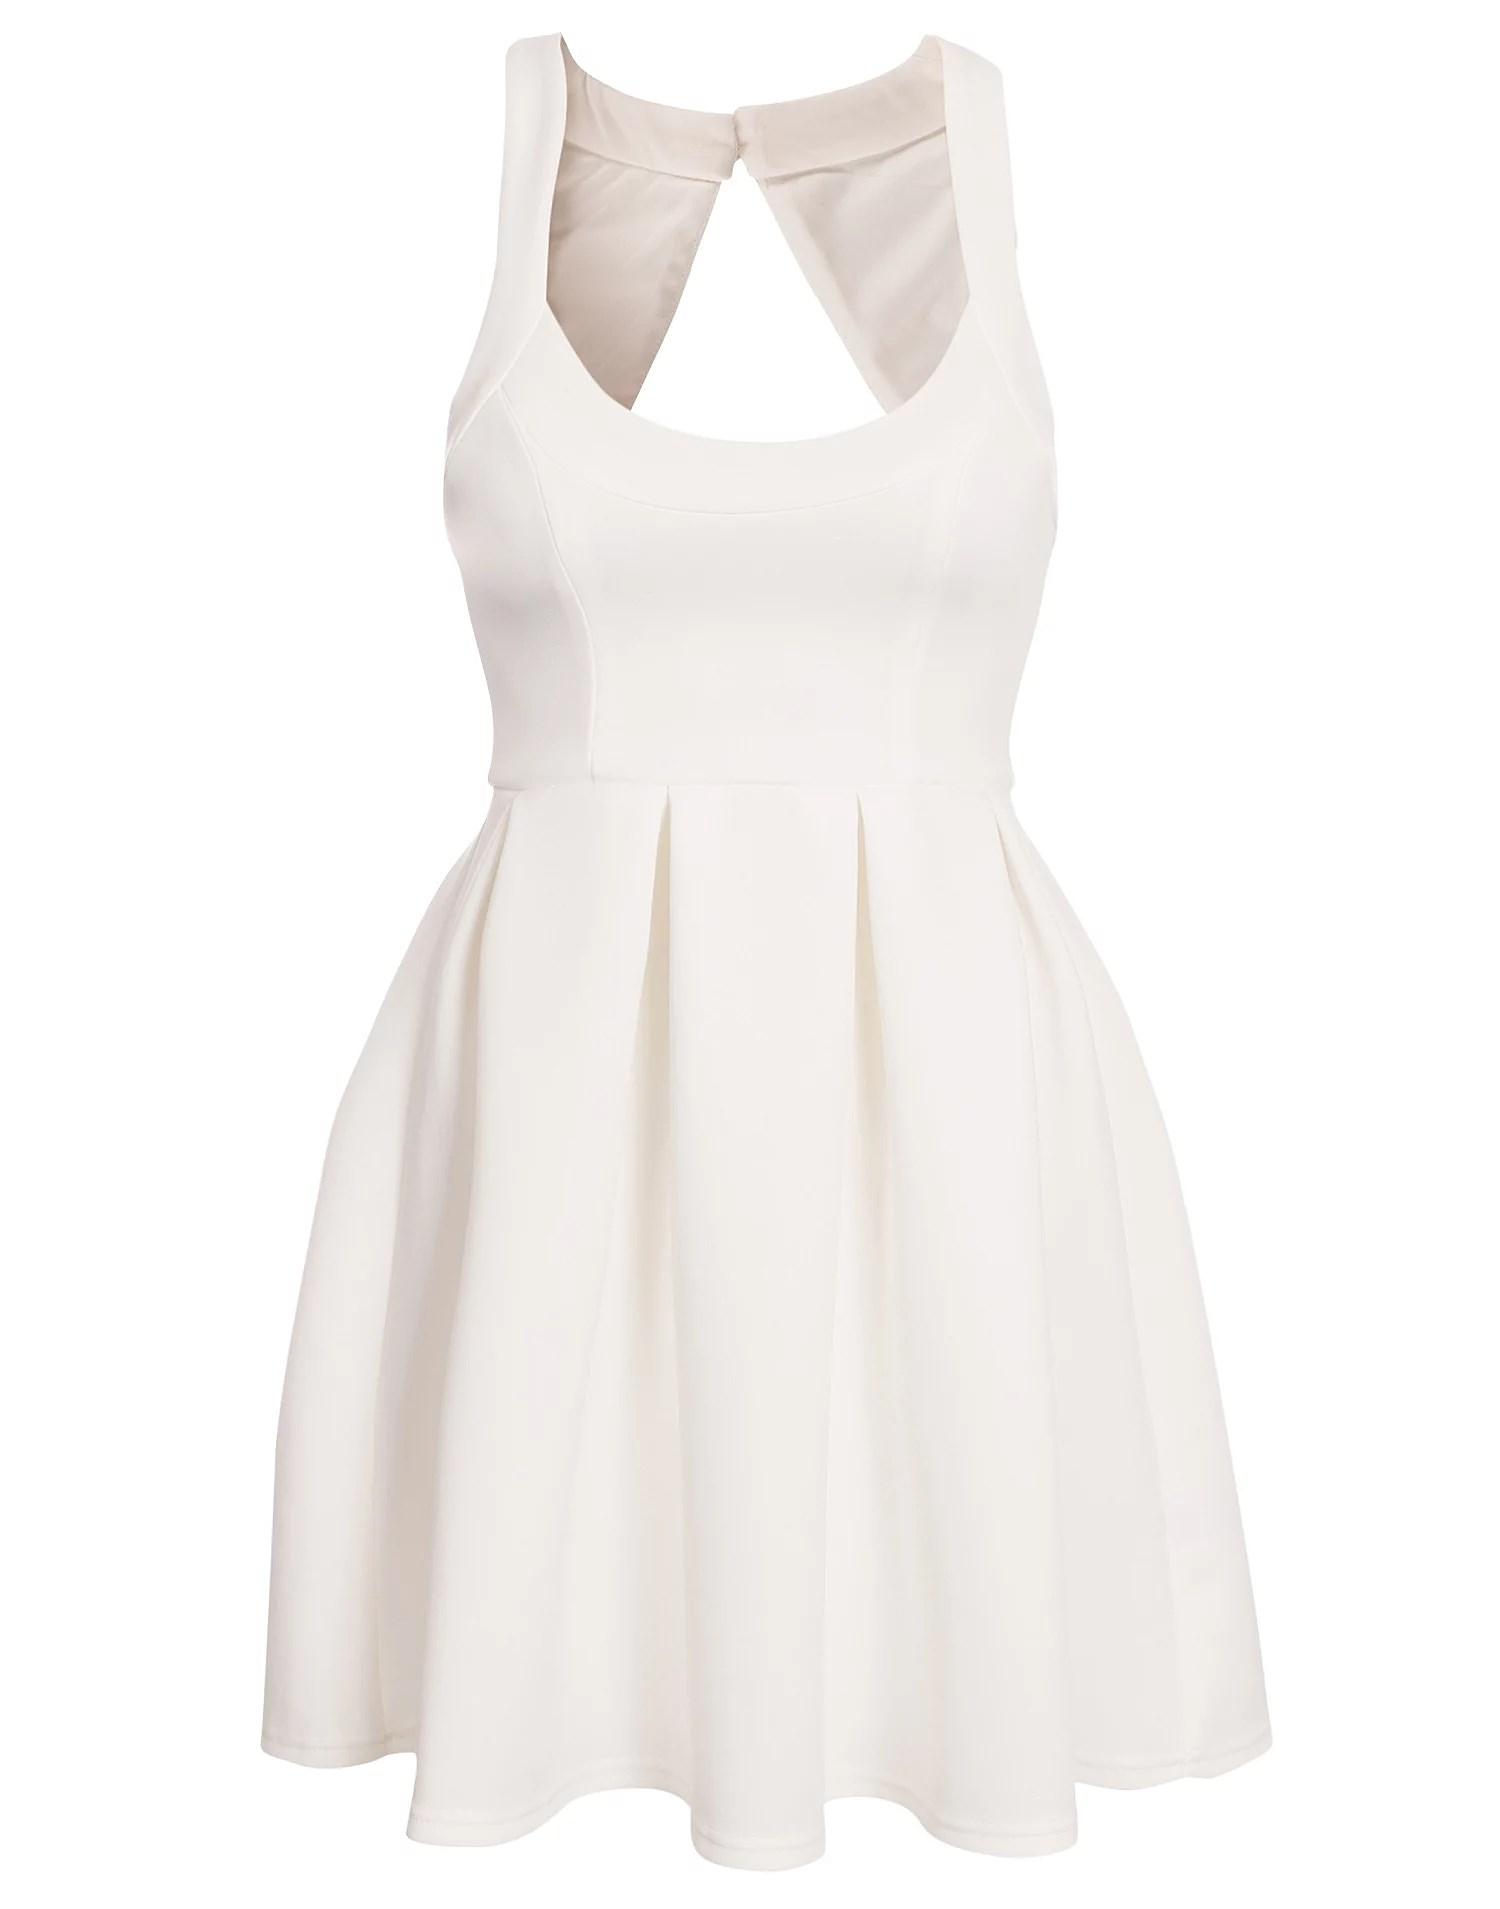 MIDSUMMER DRESSES